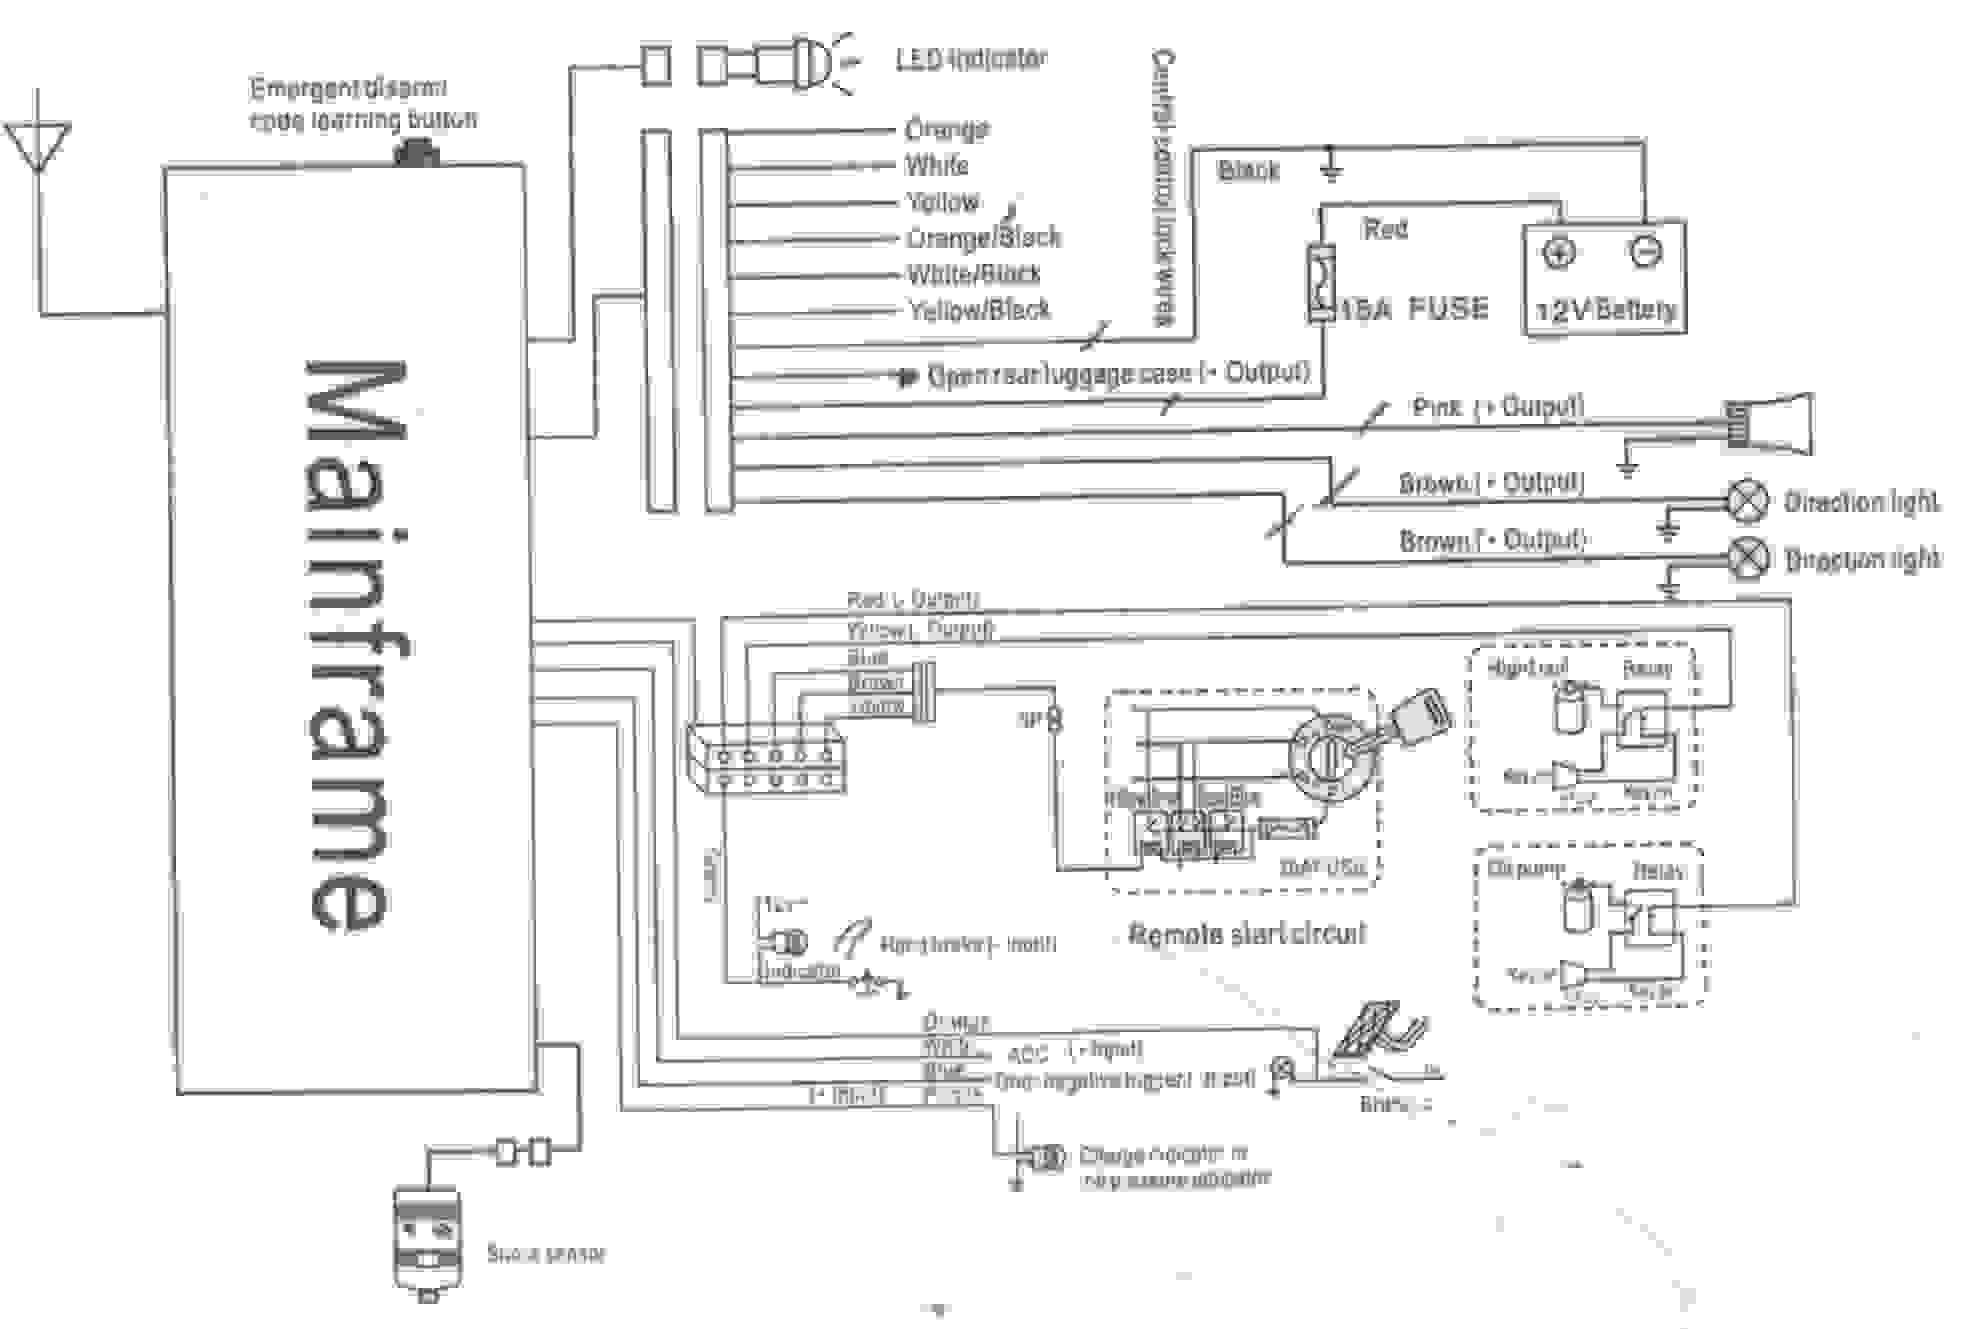 Wiring Diagram For Home Alarm System Diagram Diagramtemplate Diagramsample